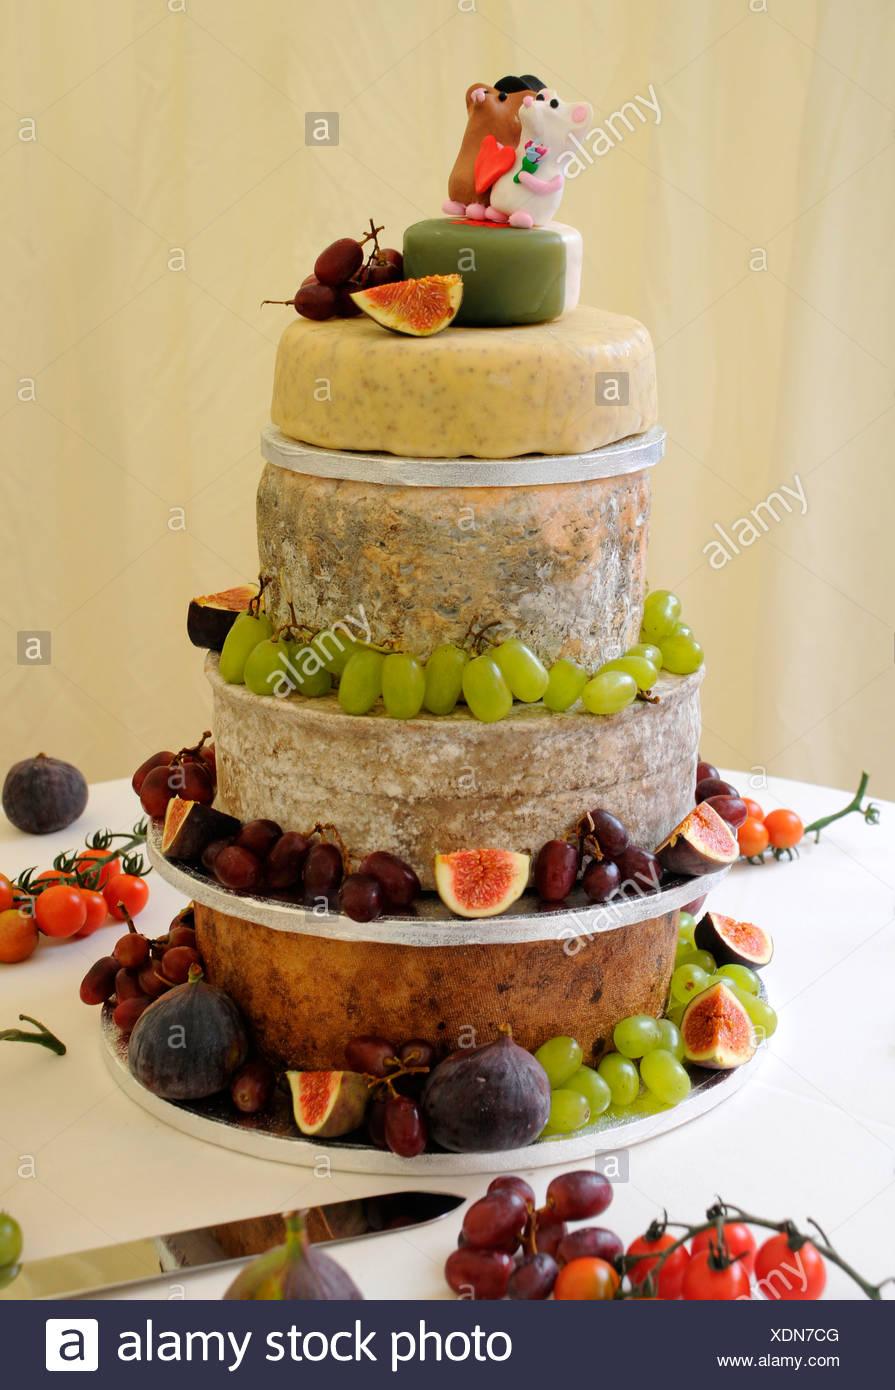 Wedding Cake Tower Stock Photos & Wedding Cake Tower Stock Images ...